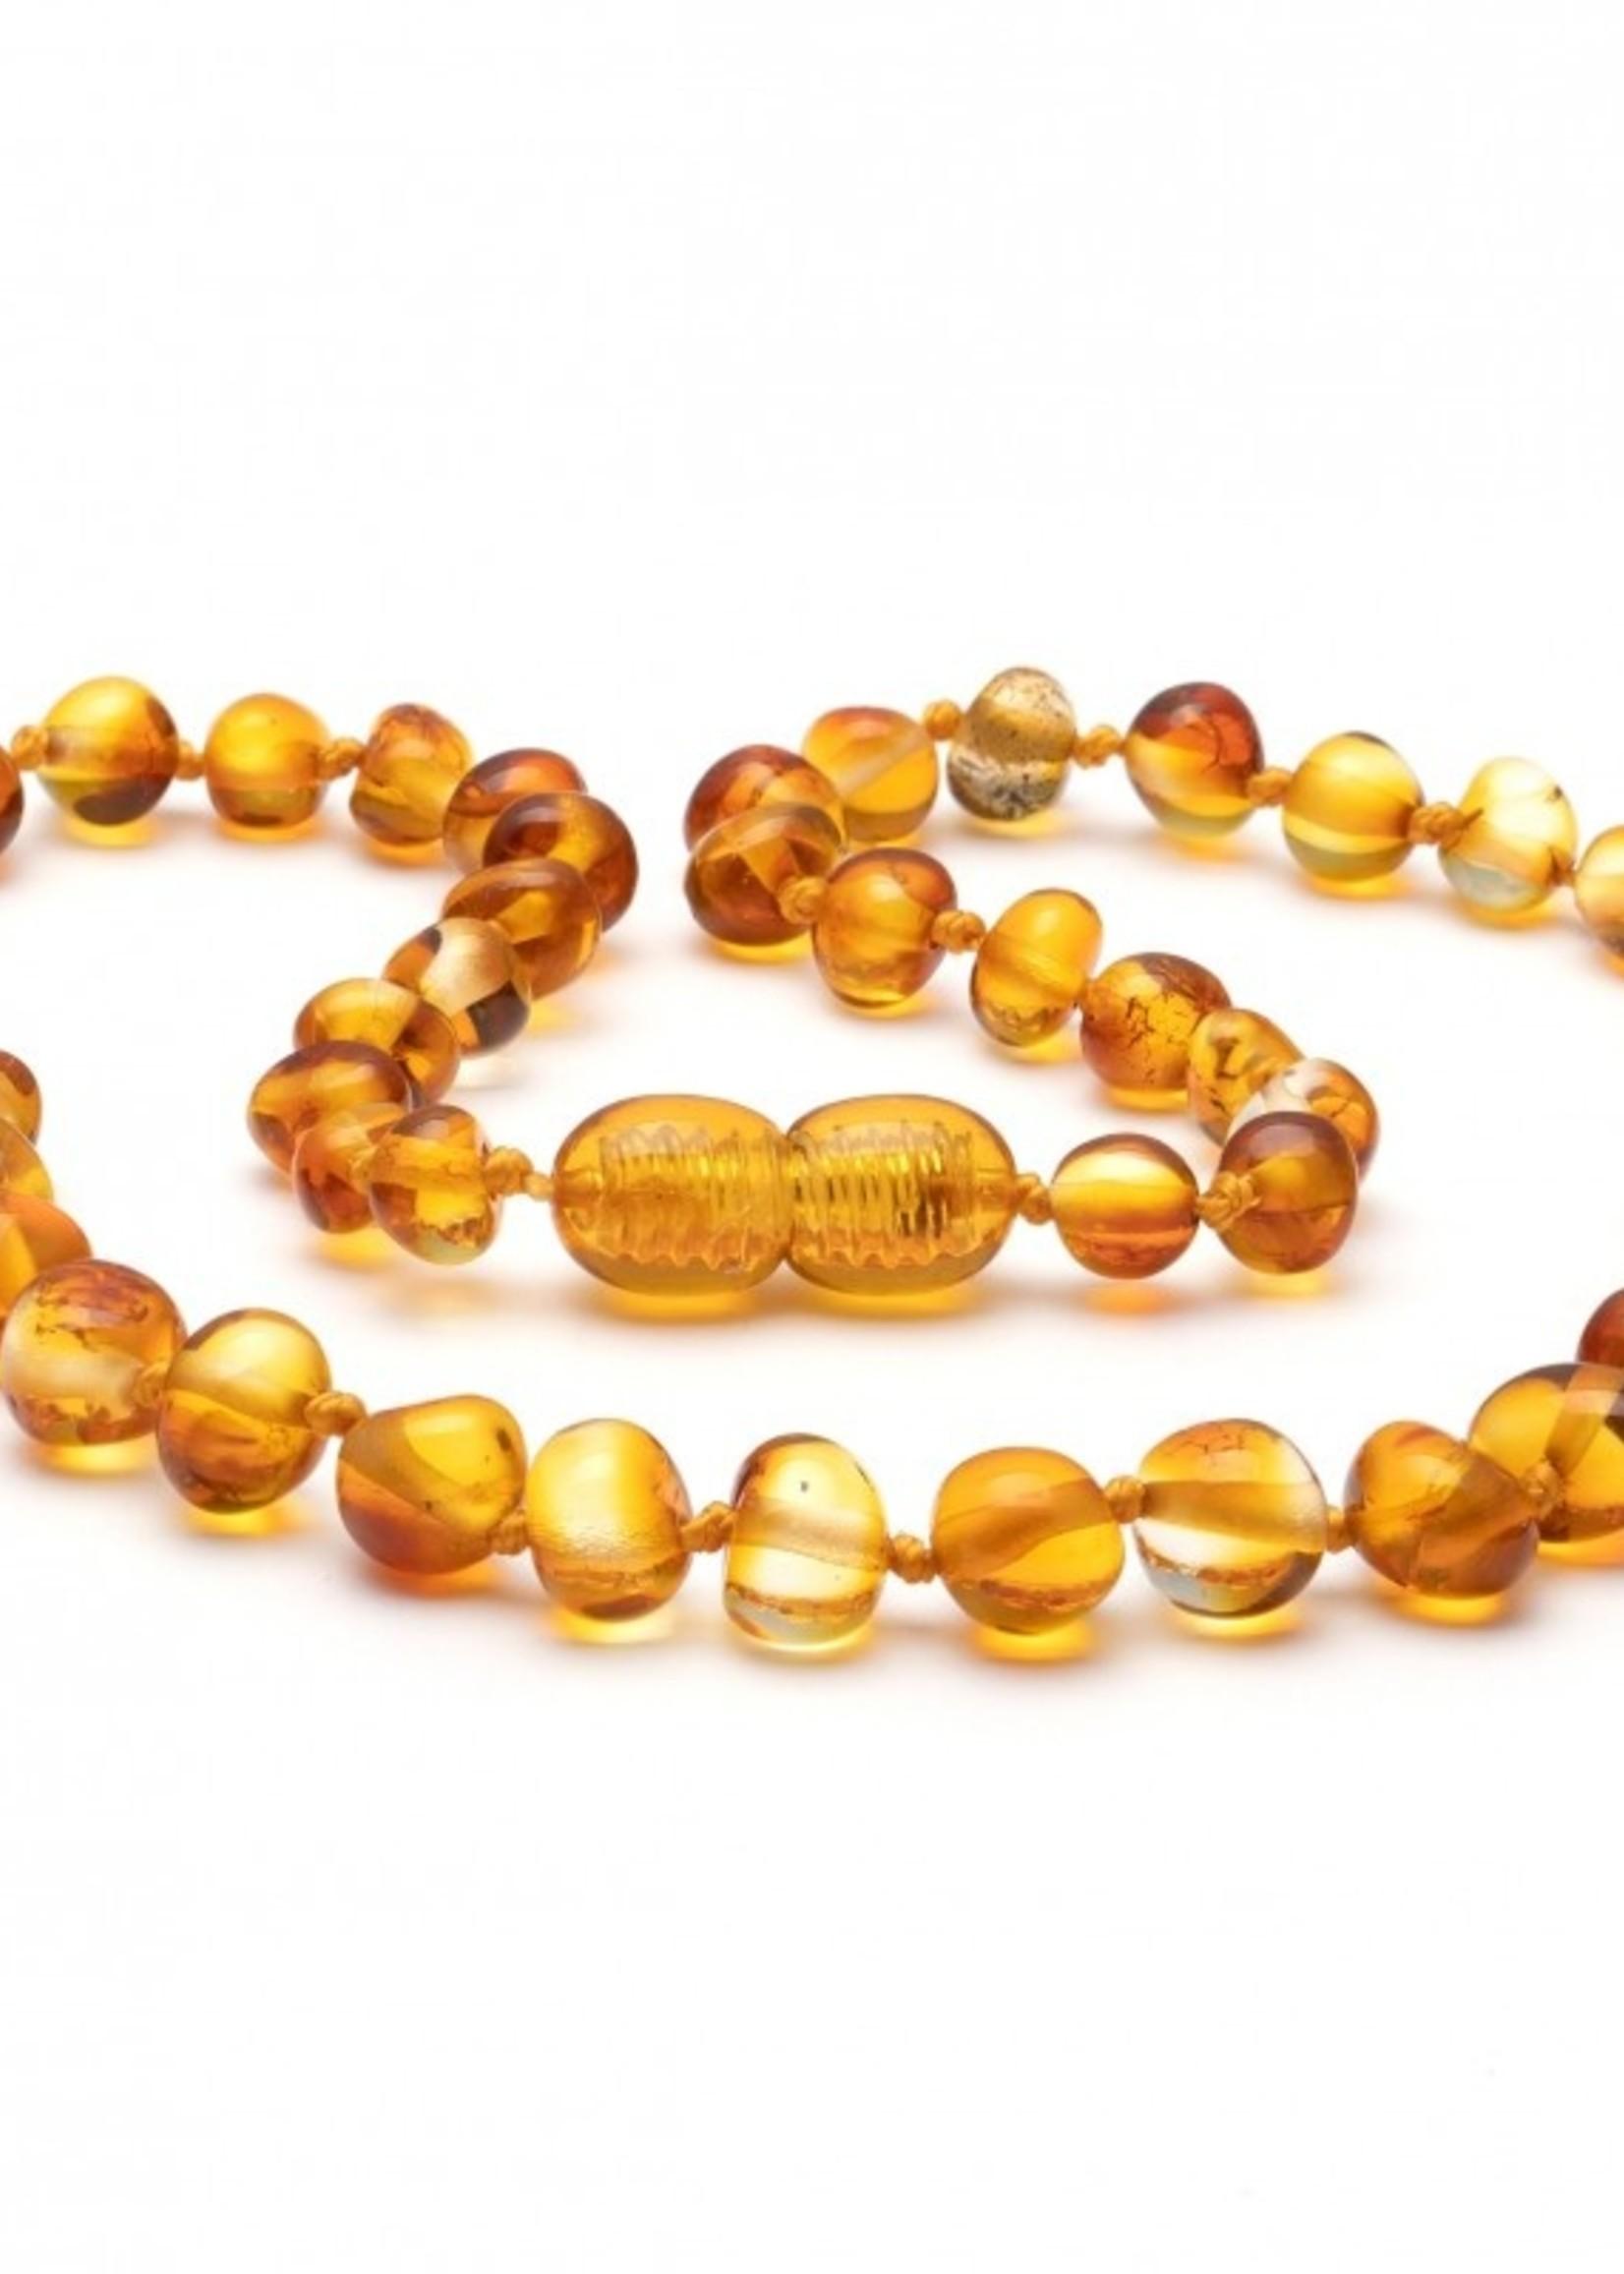 Amber Baroque Amber Teething Necklace - Honey